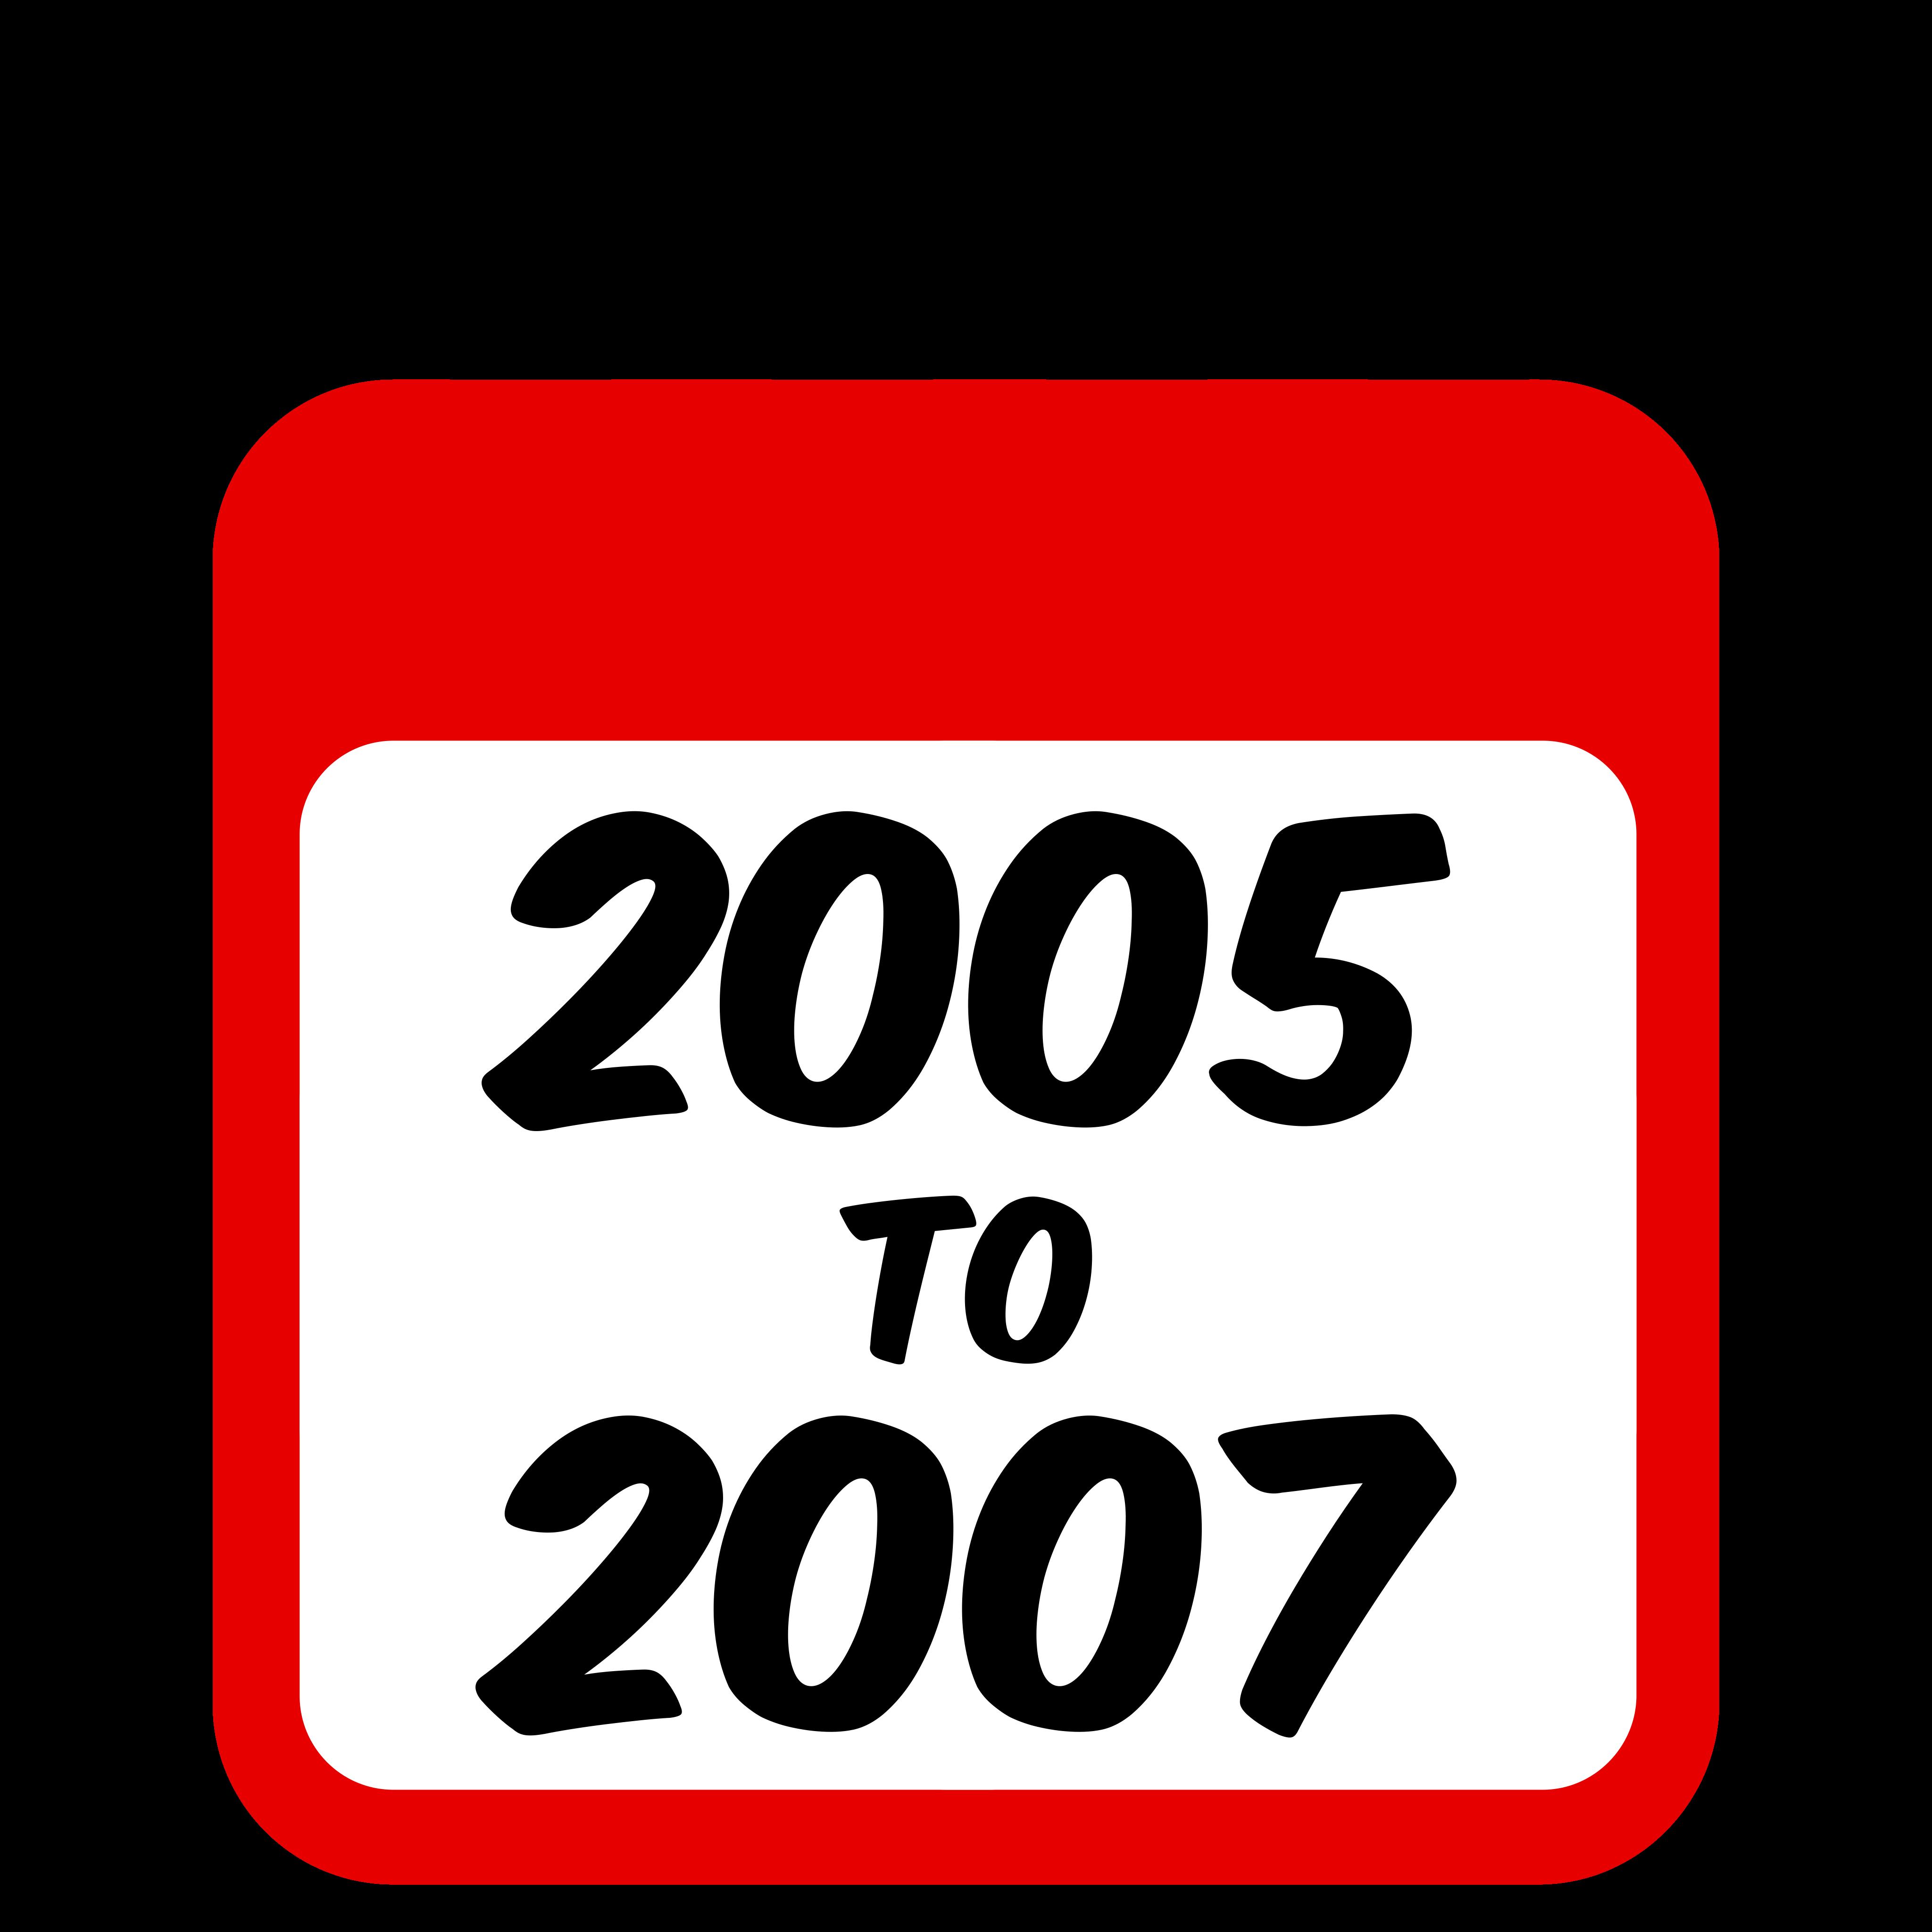 2005 to 2007 Calendar Graphic